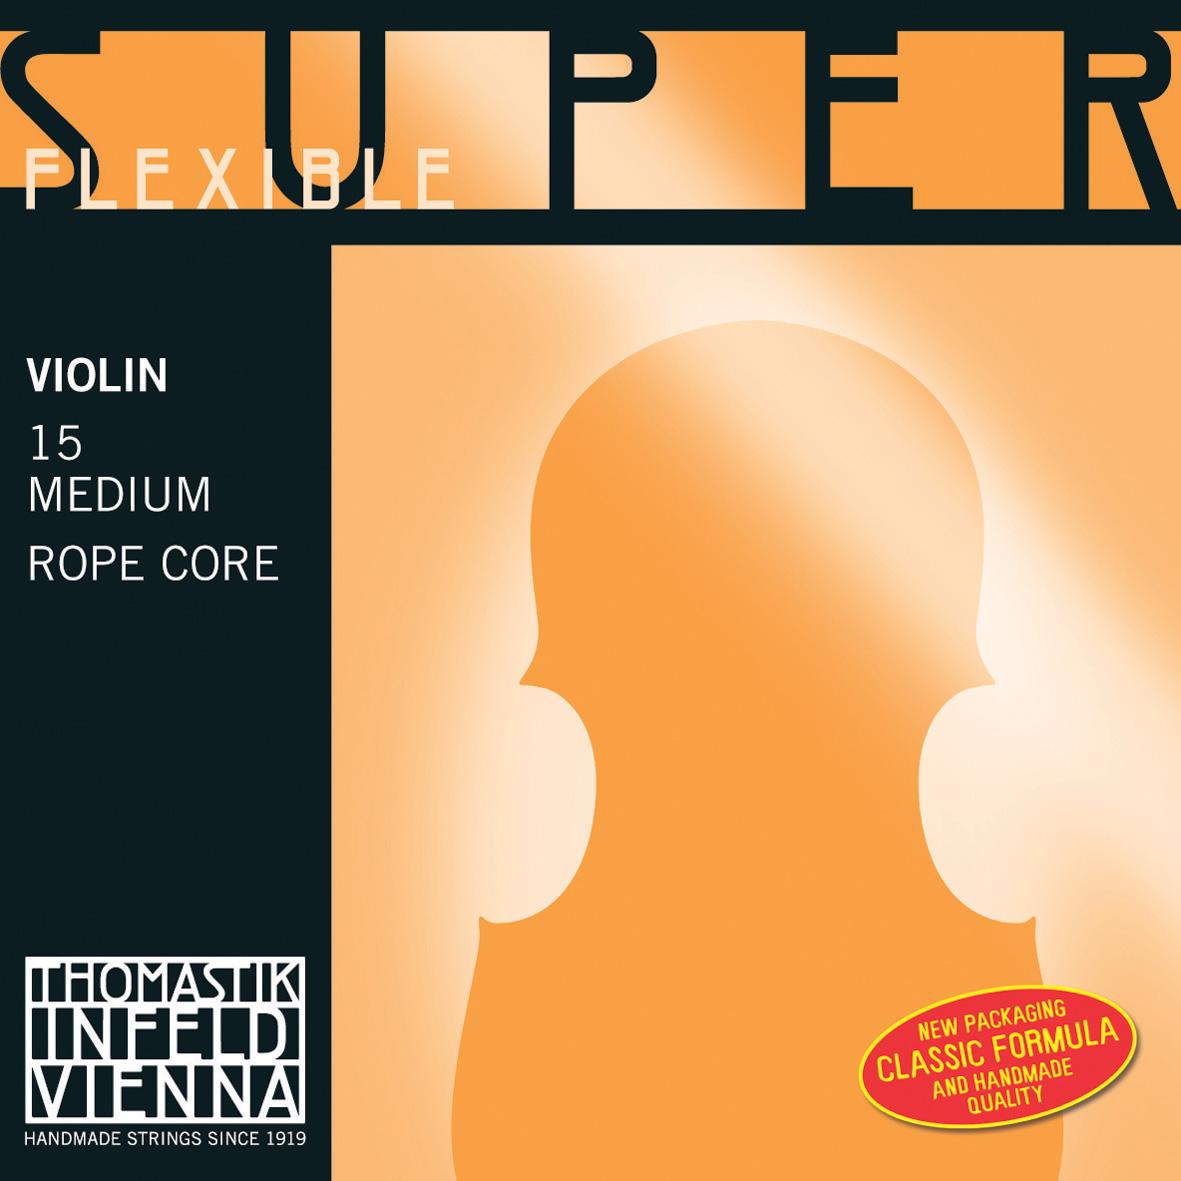 SuperFlexible Thomastik Infeld Strings